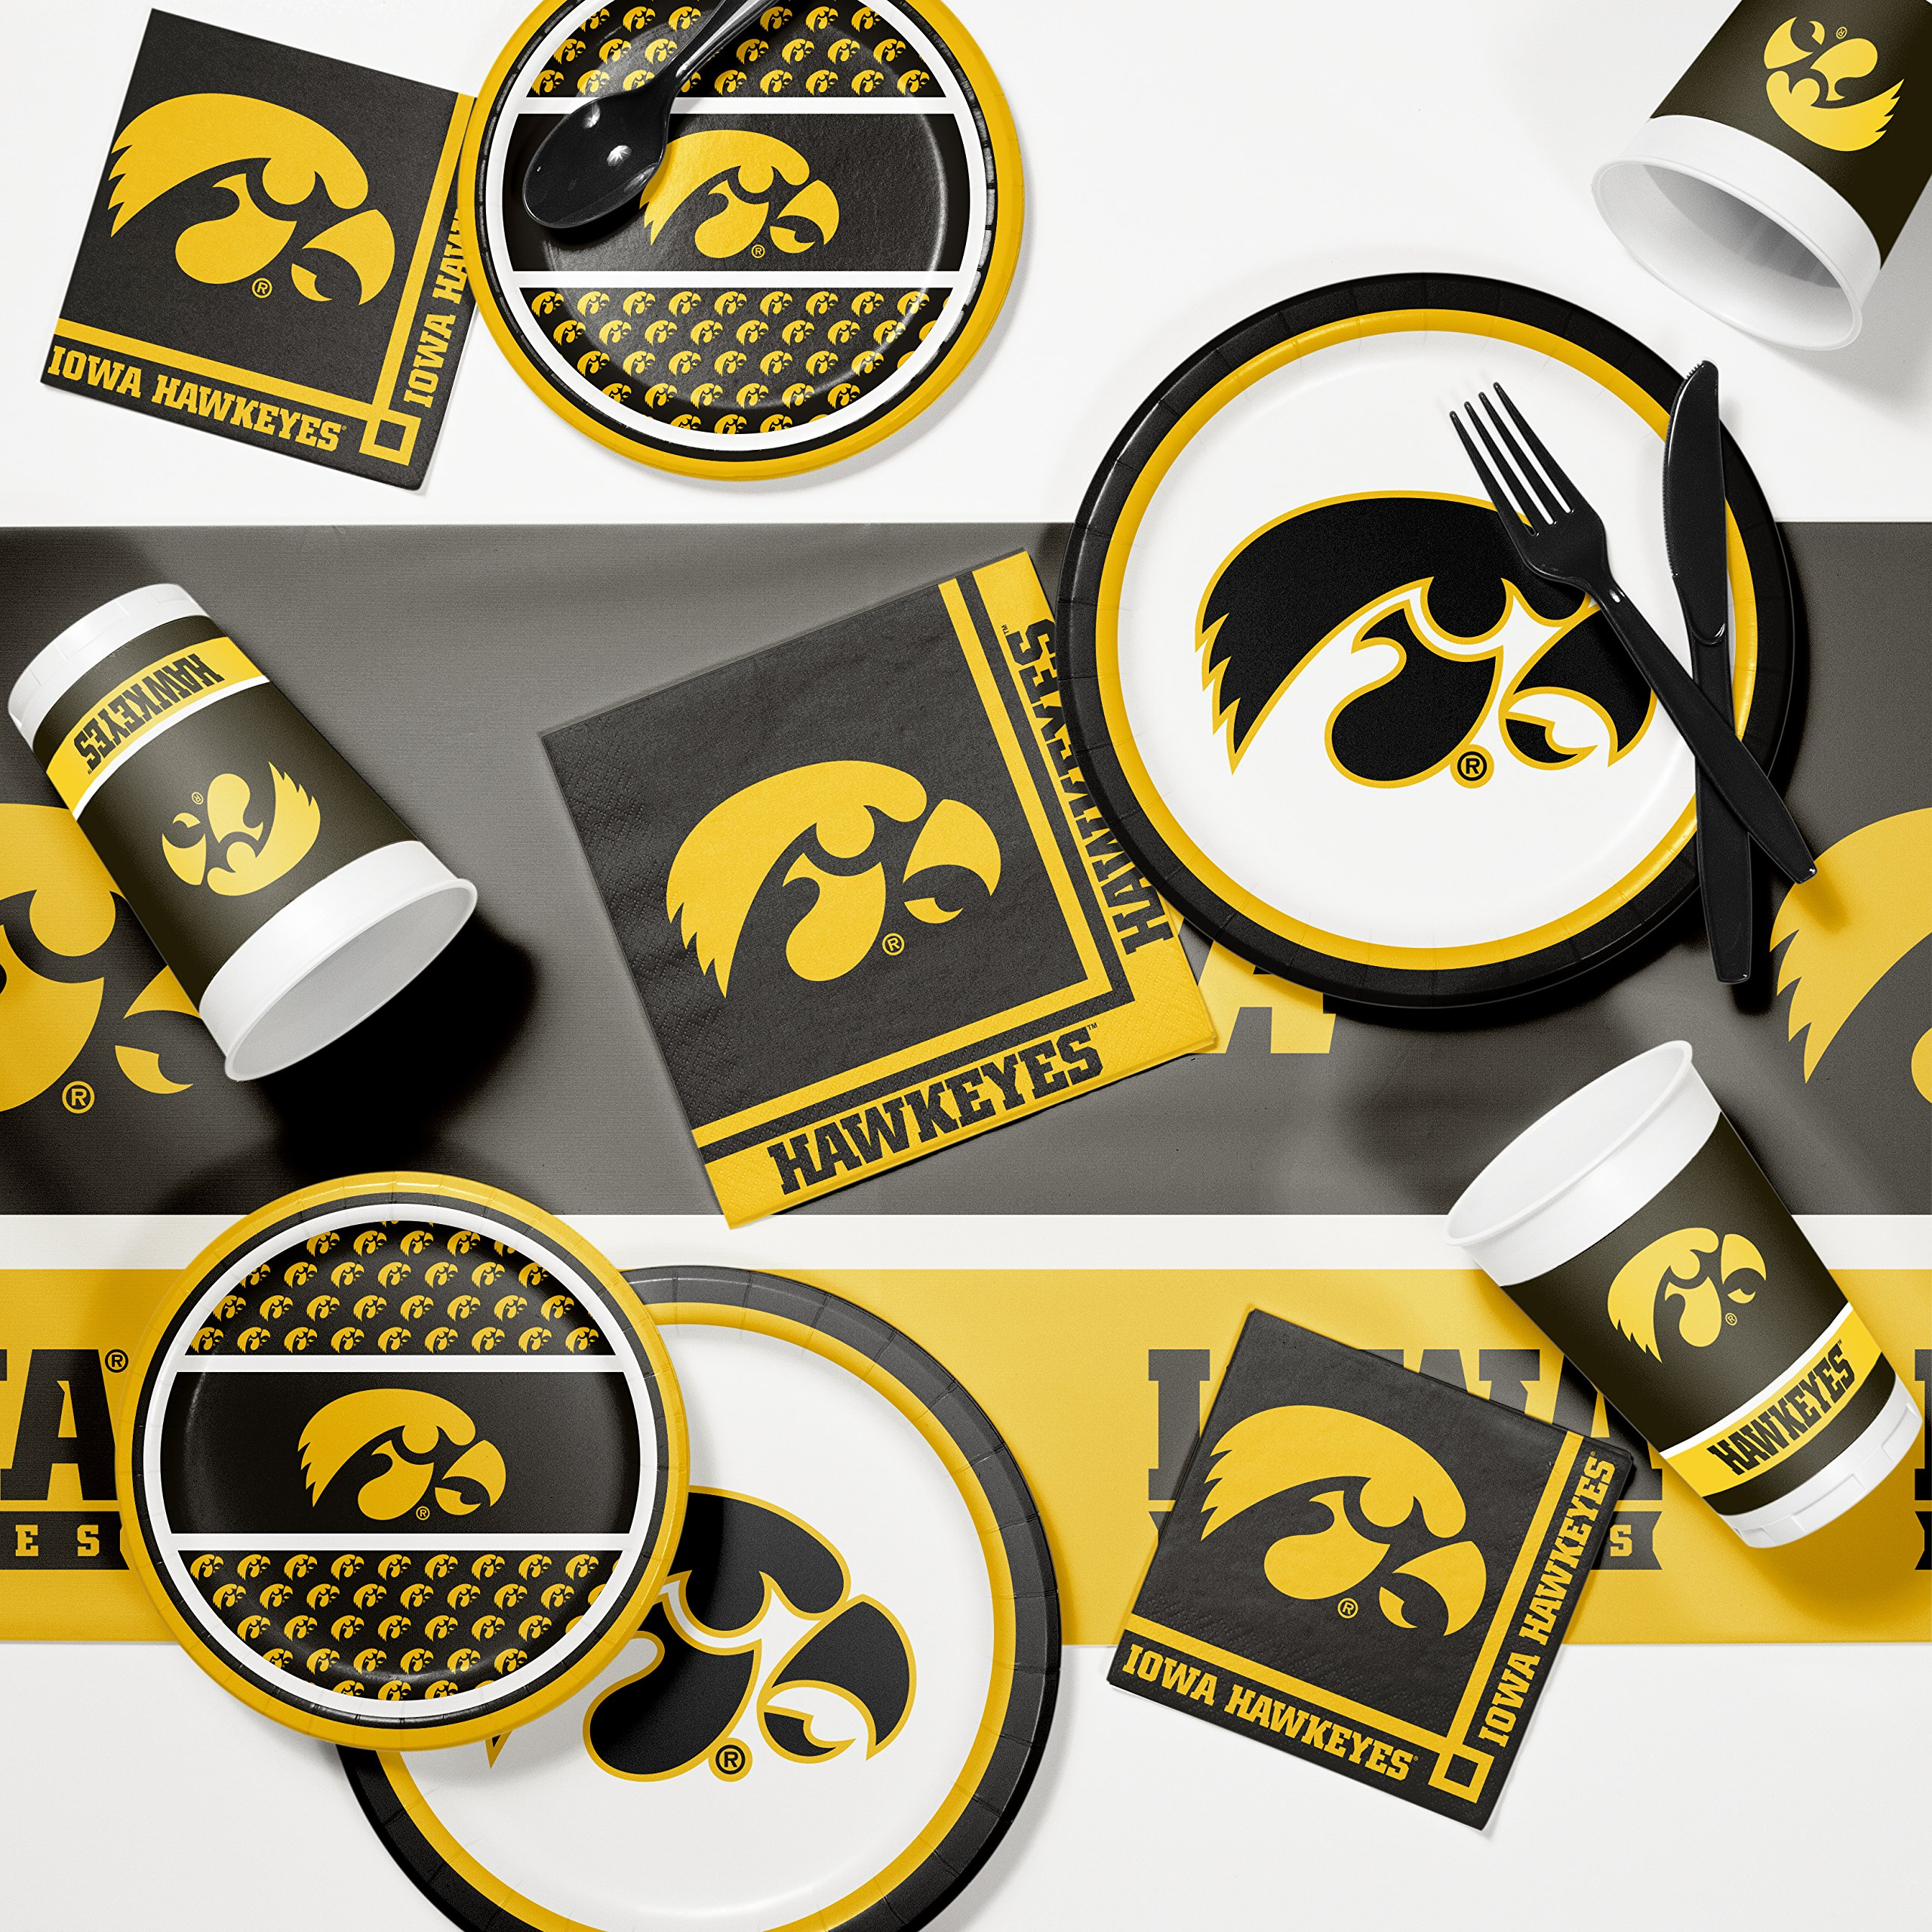 University of Iowa Game Day Party Supplies Kit